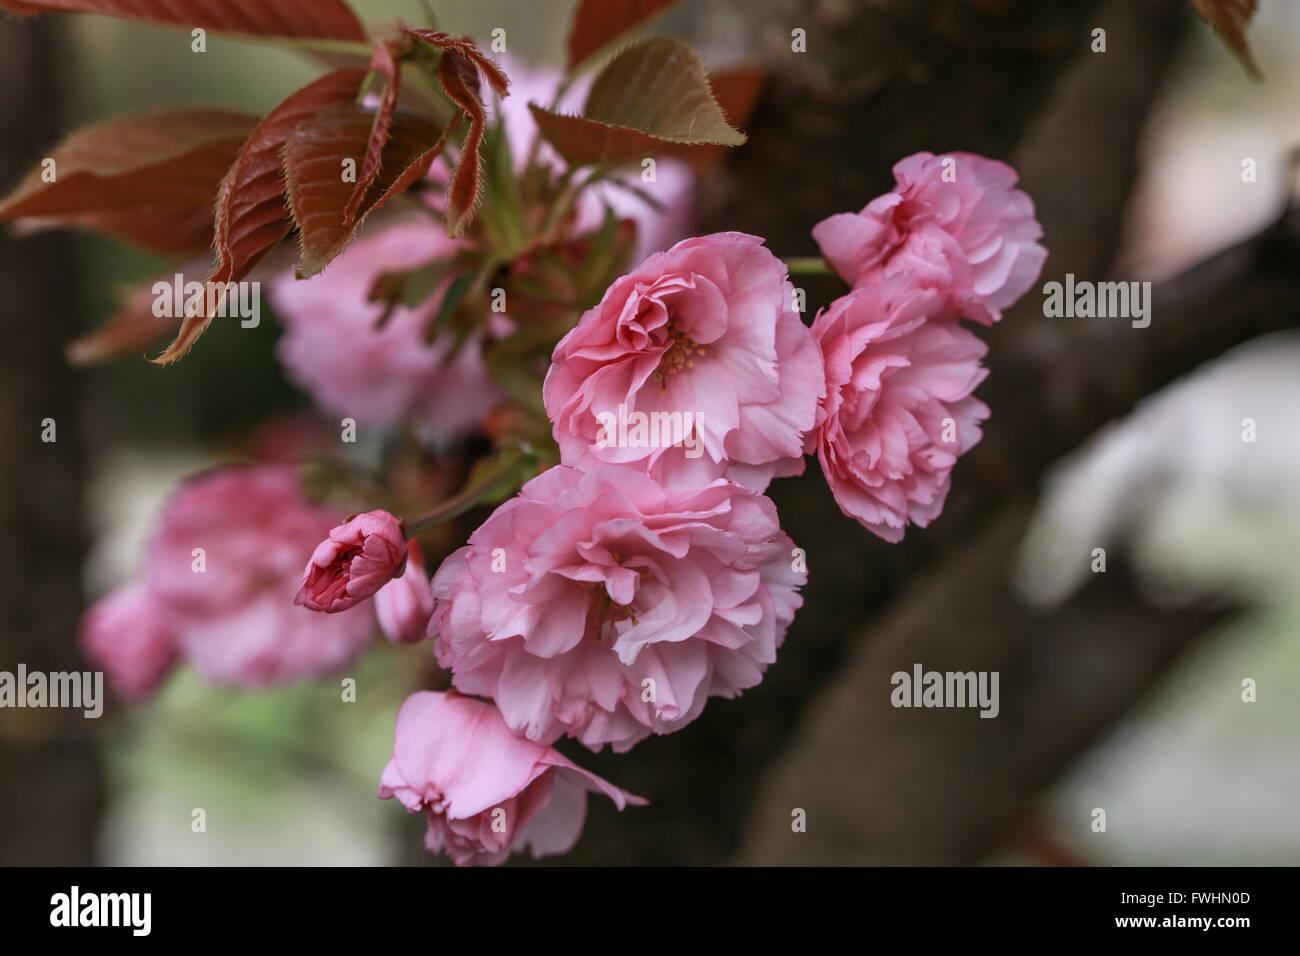 Prunus serrulata - Stock Image